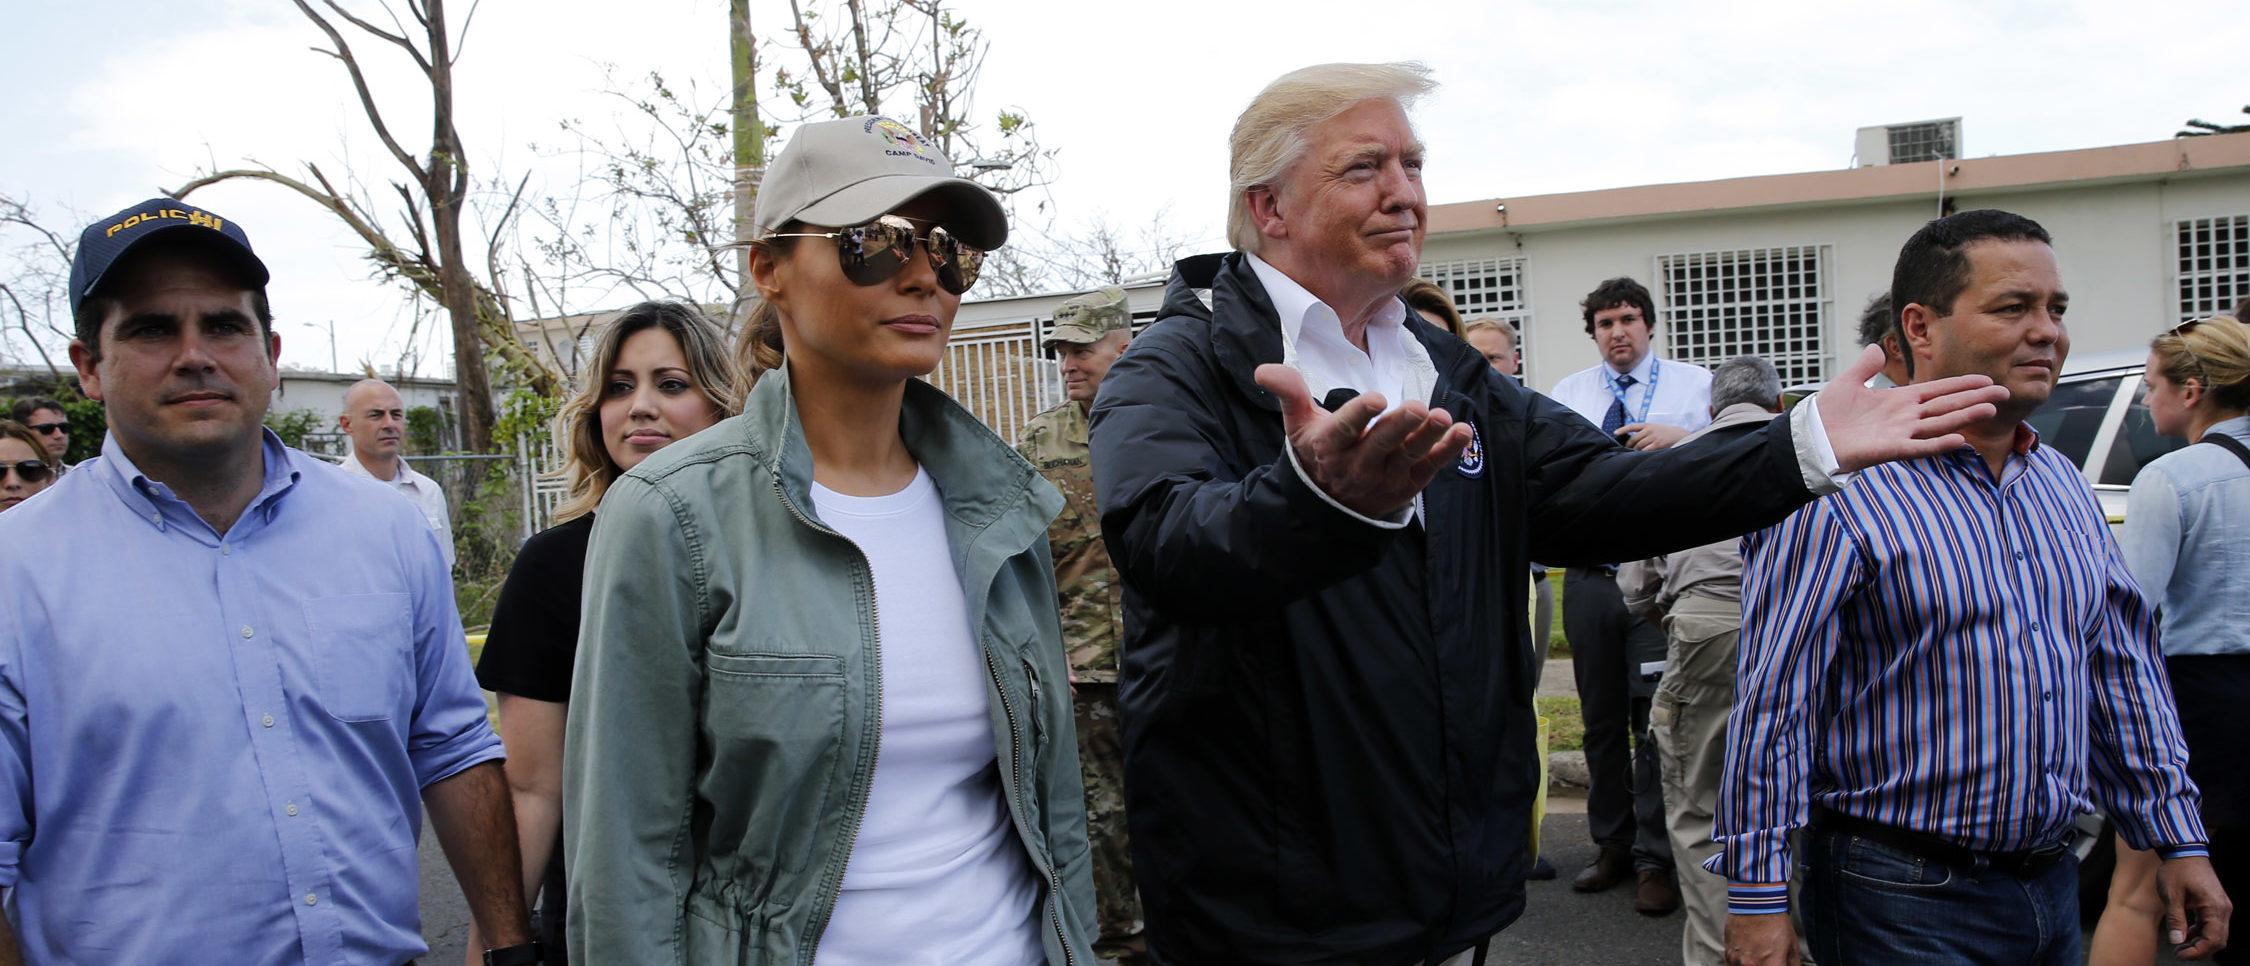 U.S. President Donald Trump and first lady Melania Trump walk through a neighborhood damaged by Hurricane Maria in Guaynabo, Puerto Rico, U.S., October 3, 2017. REUTERS/Jonathan Ernst - HP1EDA31DBA0A